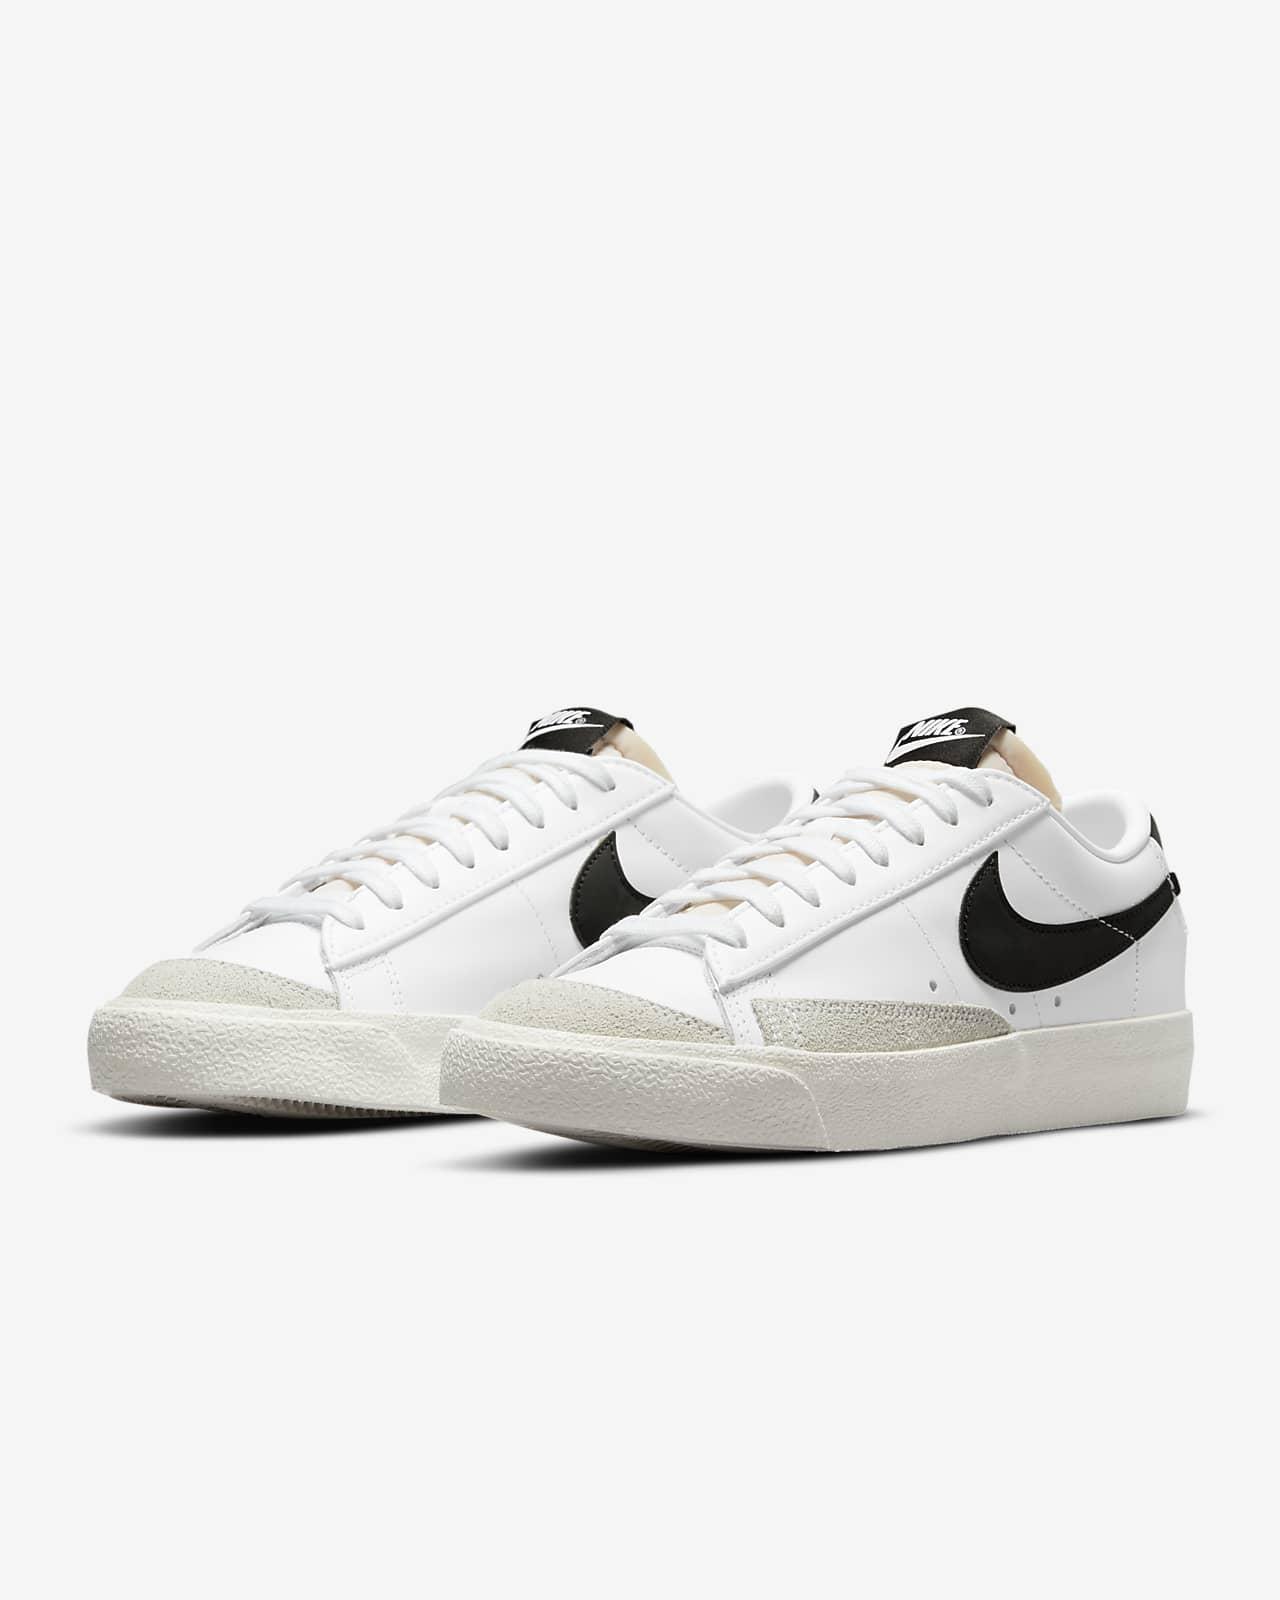 Chaussure Nike Blazer Low '77 pour Femme